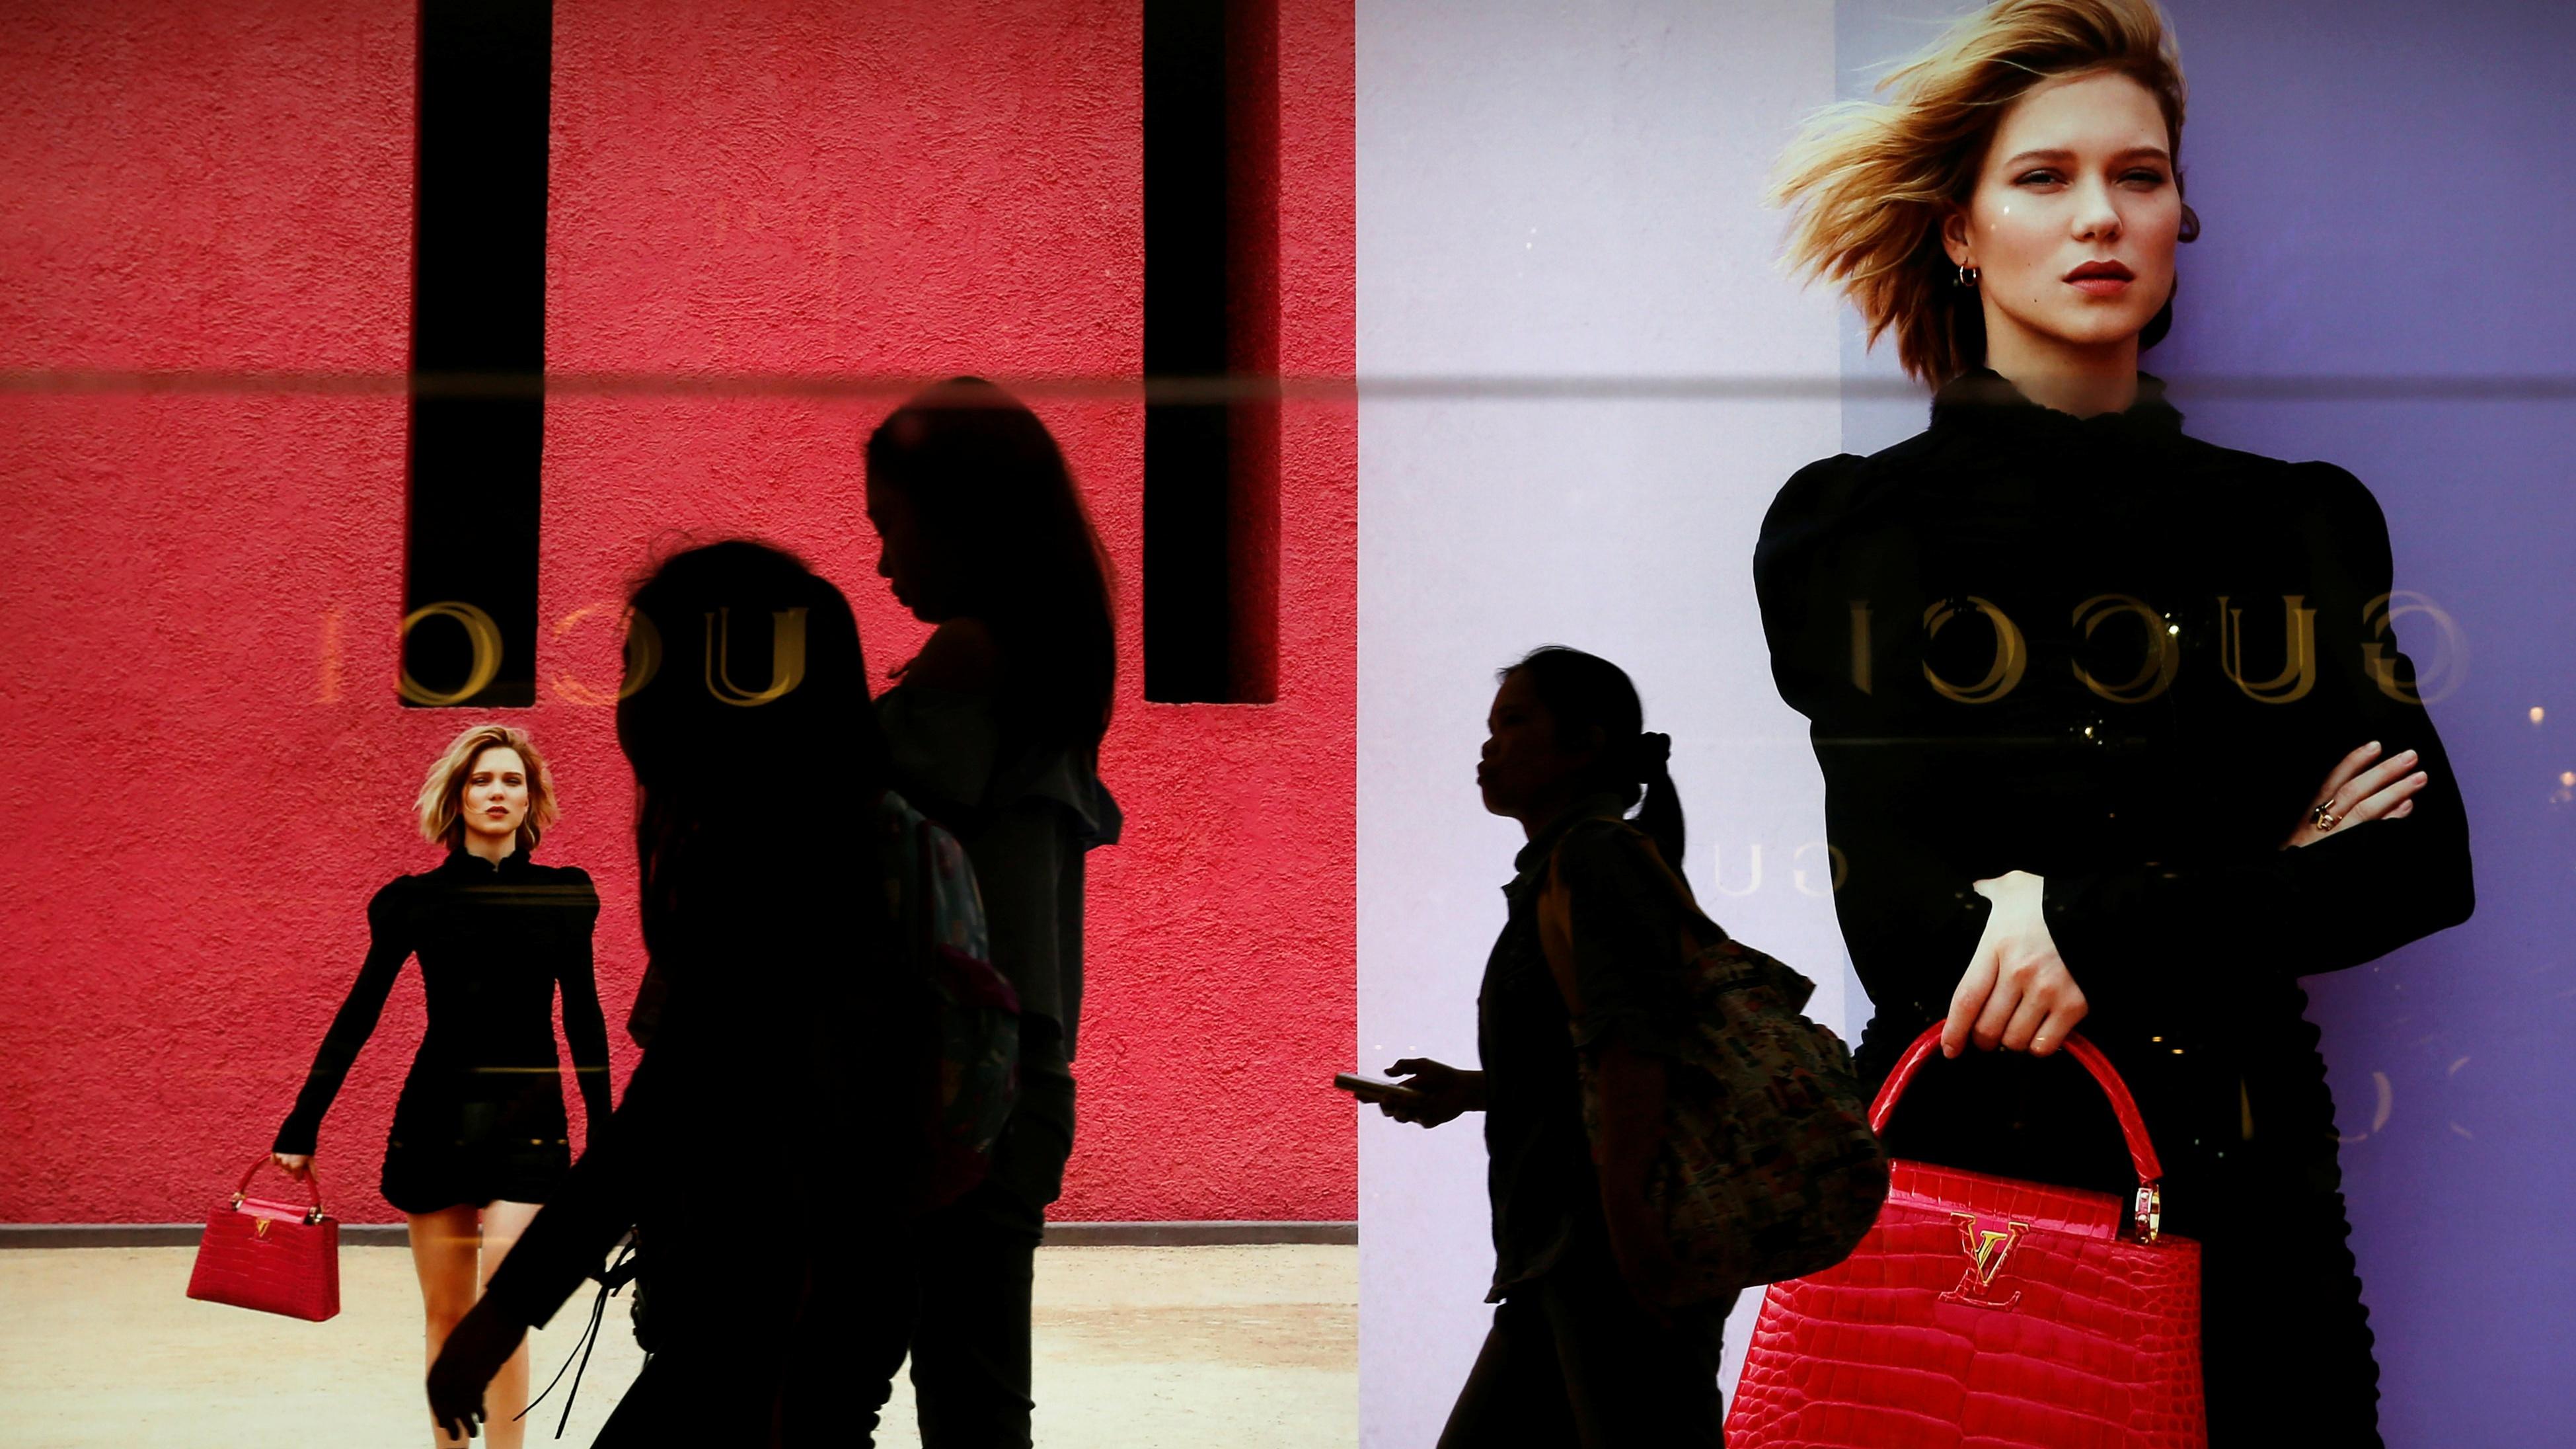 d71d534eb9b38 For luxury brands like Louis Vuitton (LVMHF), Amazon (AMZN) is a ...